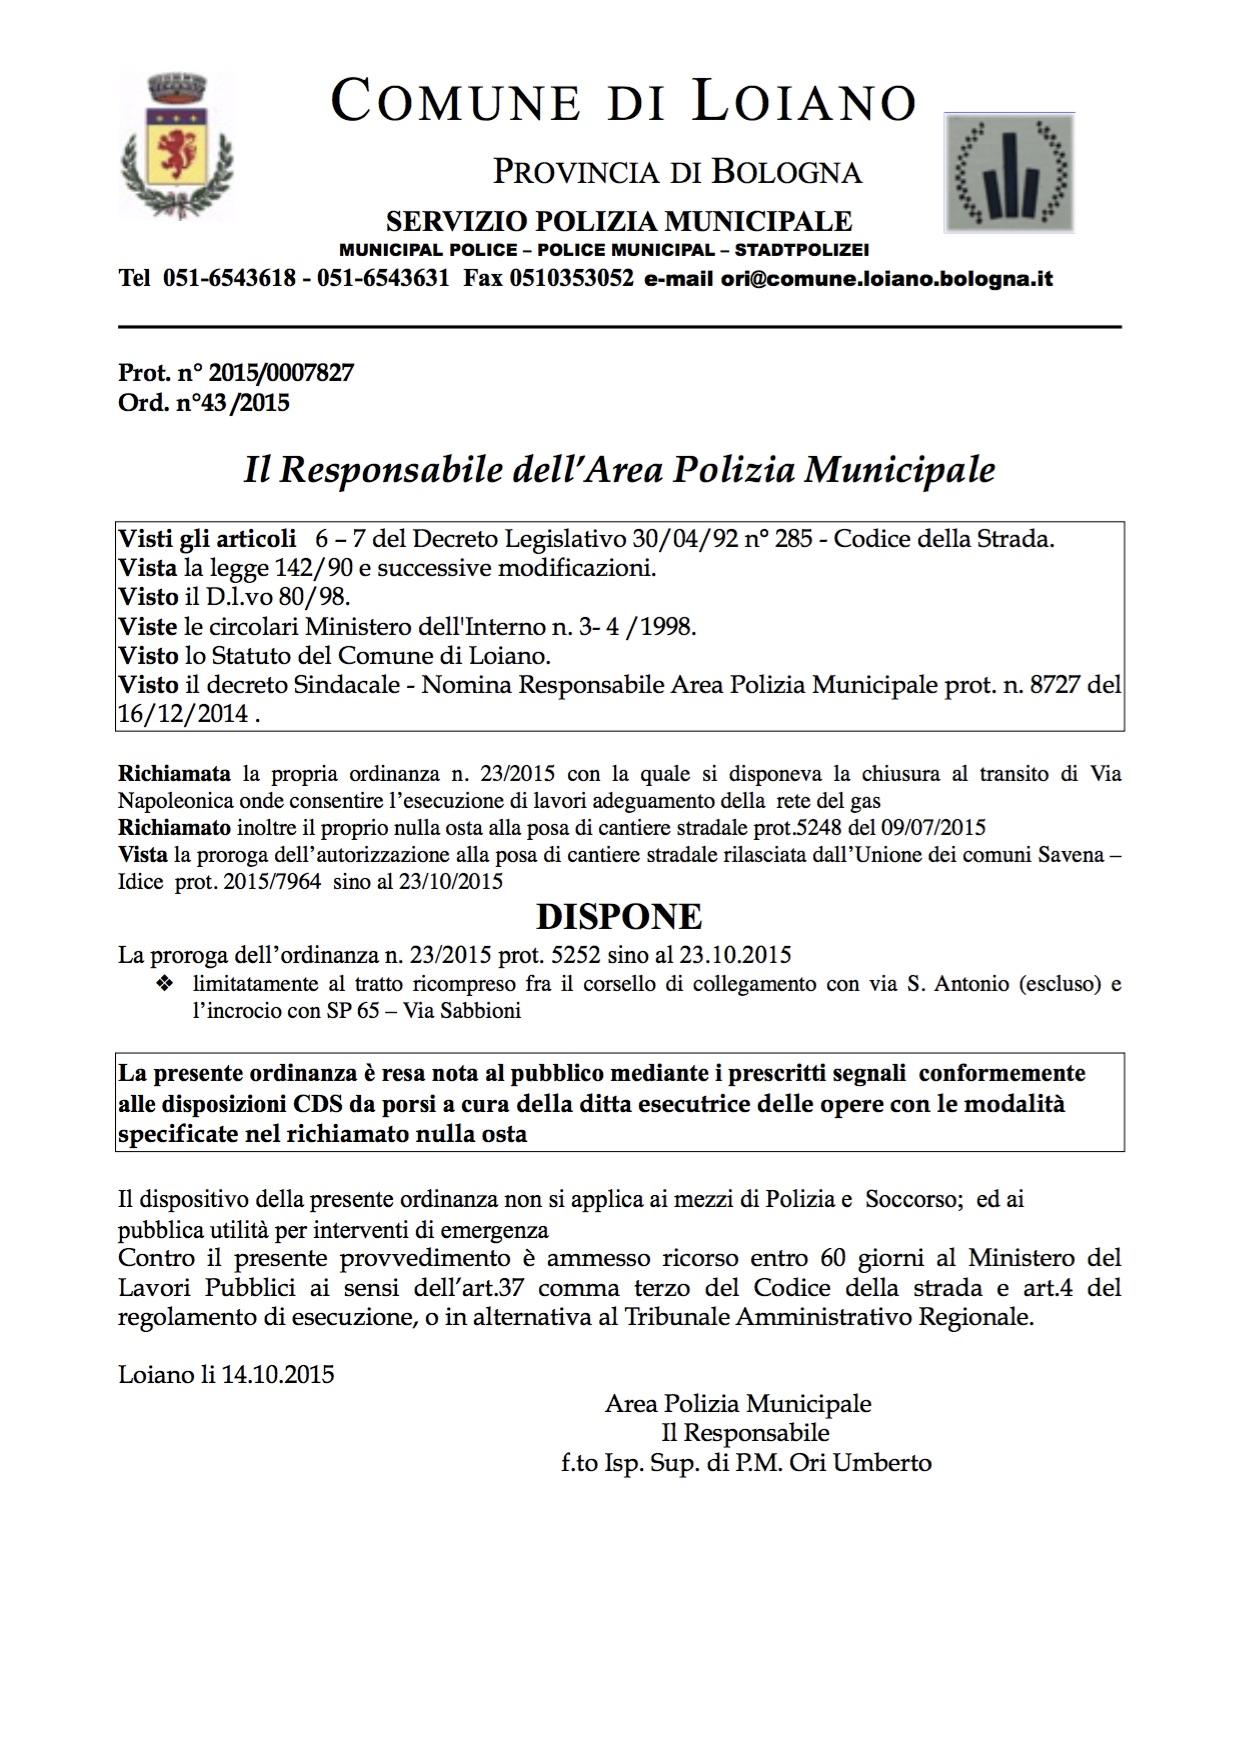 polizia municipale bologna orari via ferrari - photo#37